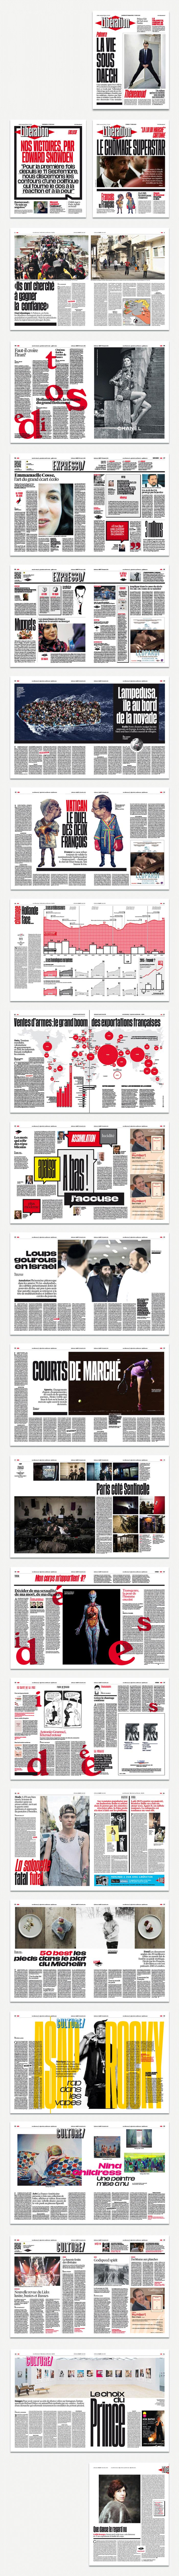 Libération 2015 redesign – a bolder Libé 2